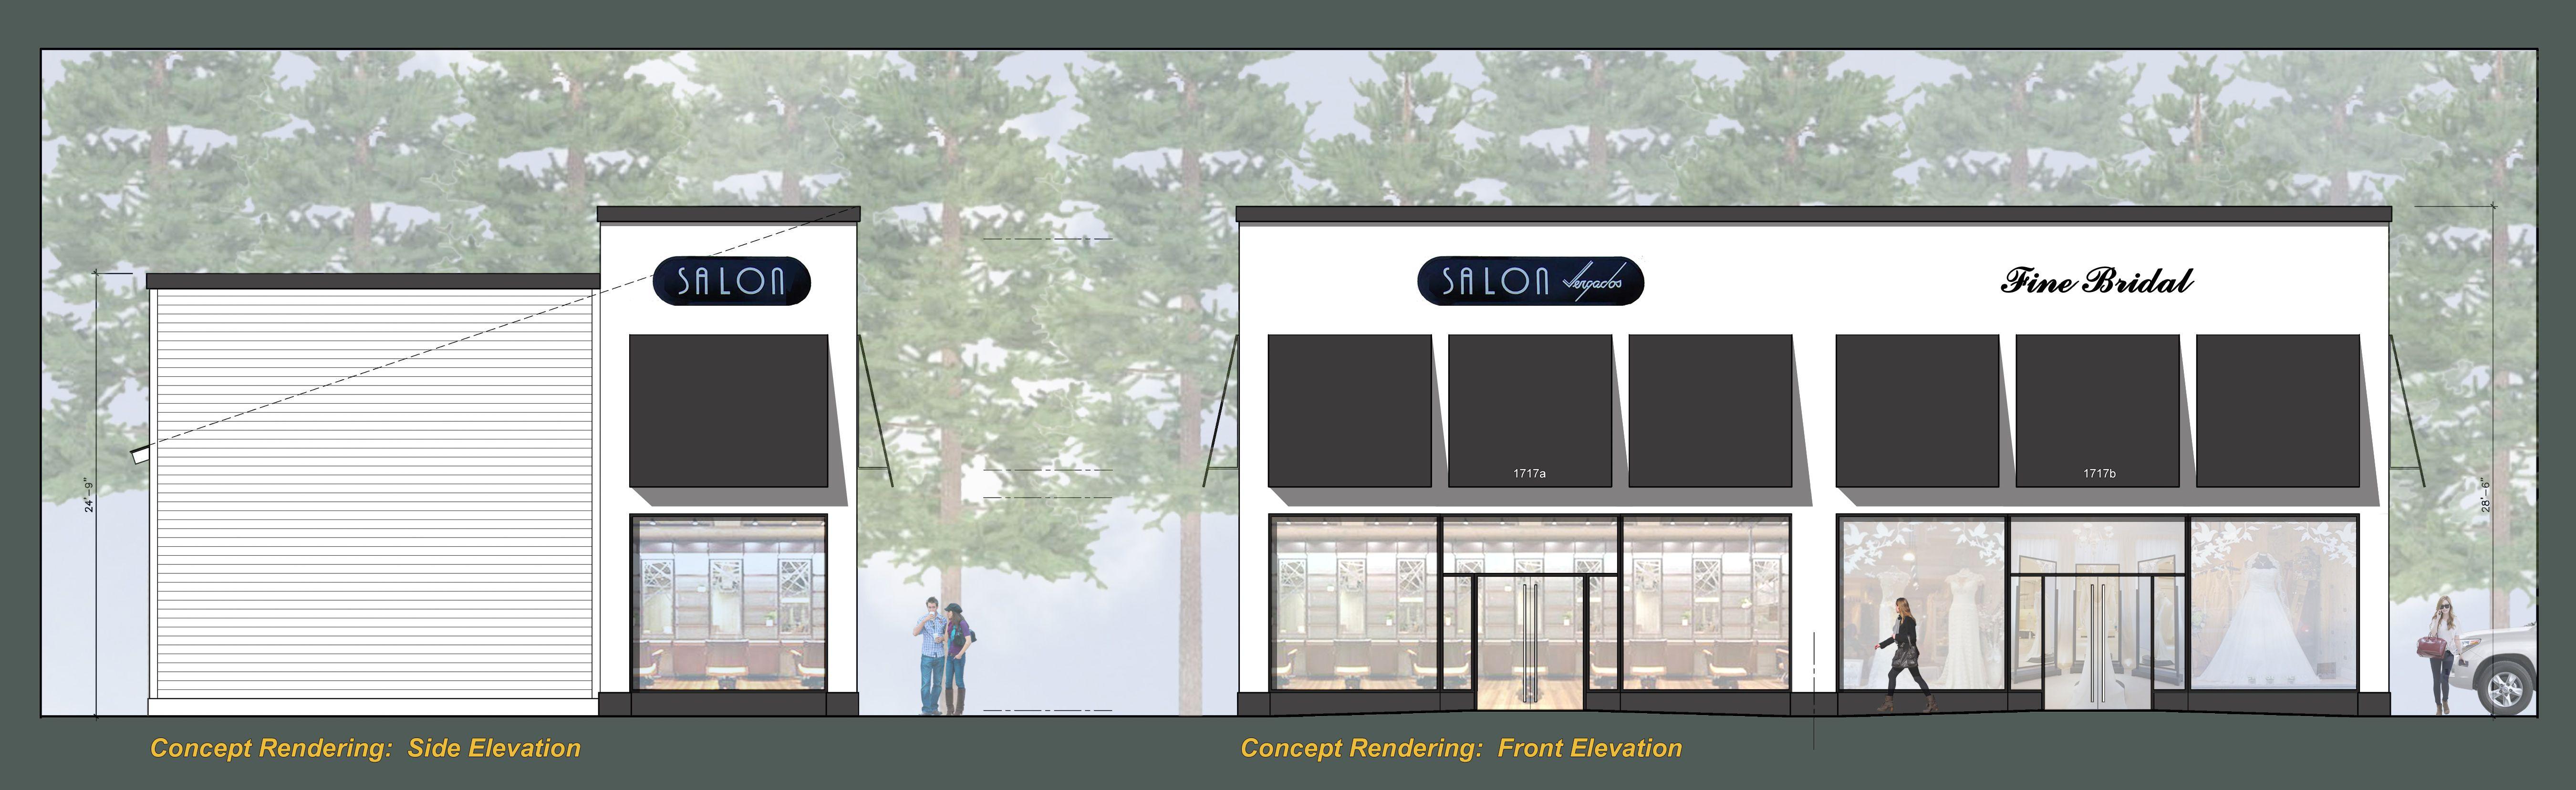 Conceptual Design For New Retail Commercial Building On Boston S North Shore Www Instagram Com Tektoniks Architects Architect Conceptual Design Retail Design